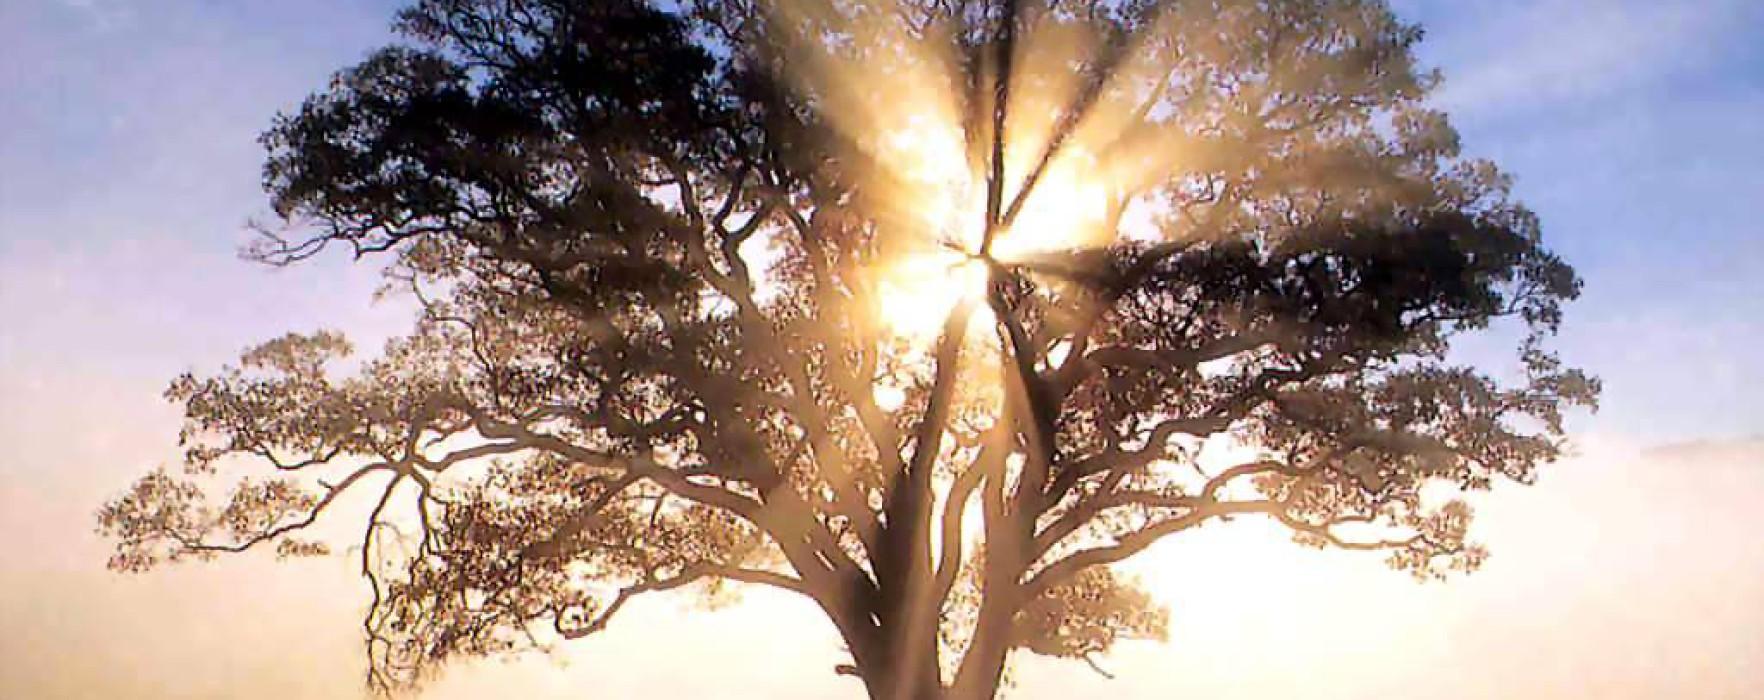 America_-_oak_tree_in_new_england_sunrise-1764x700